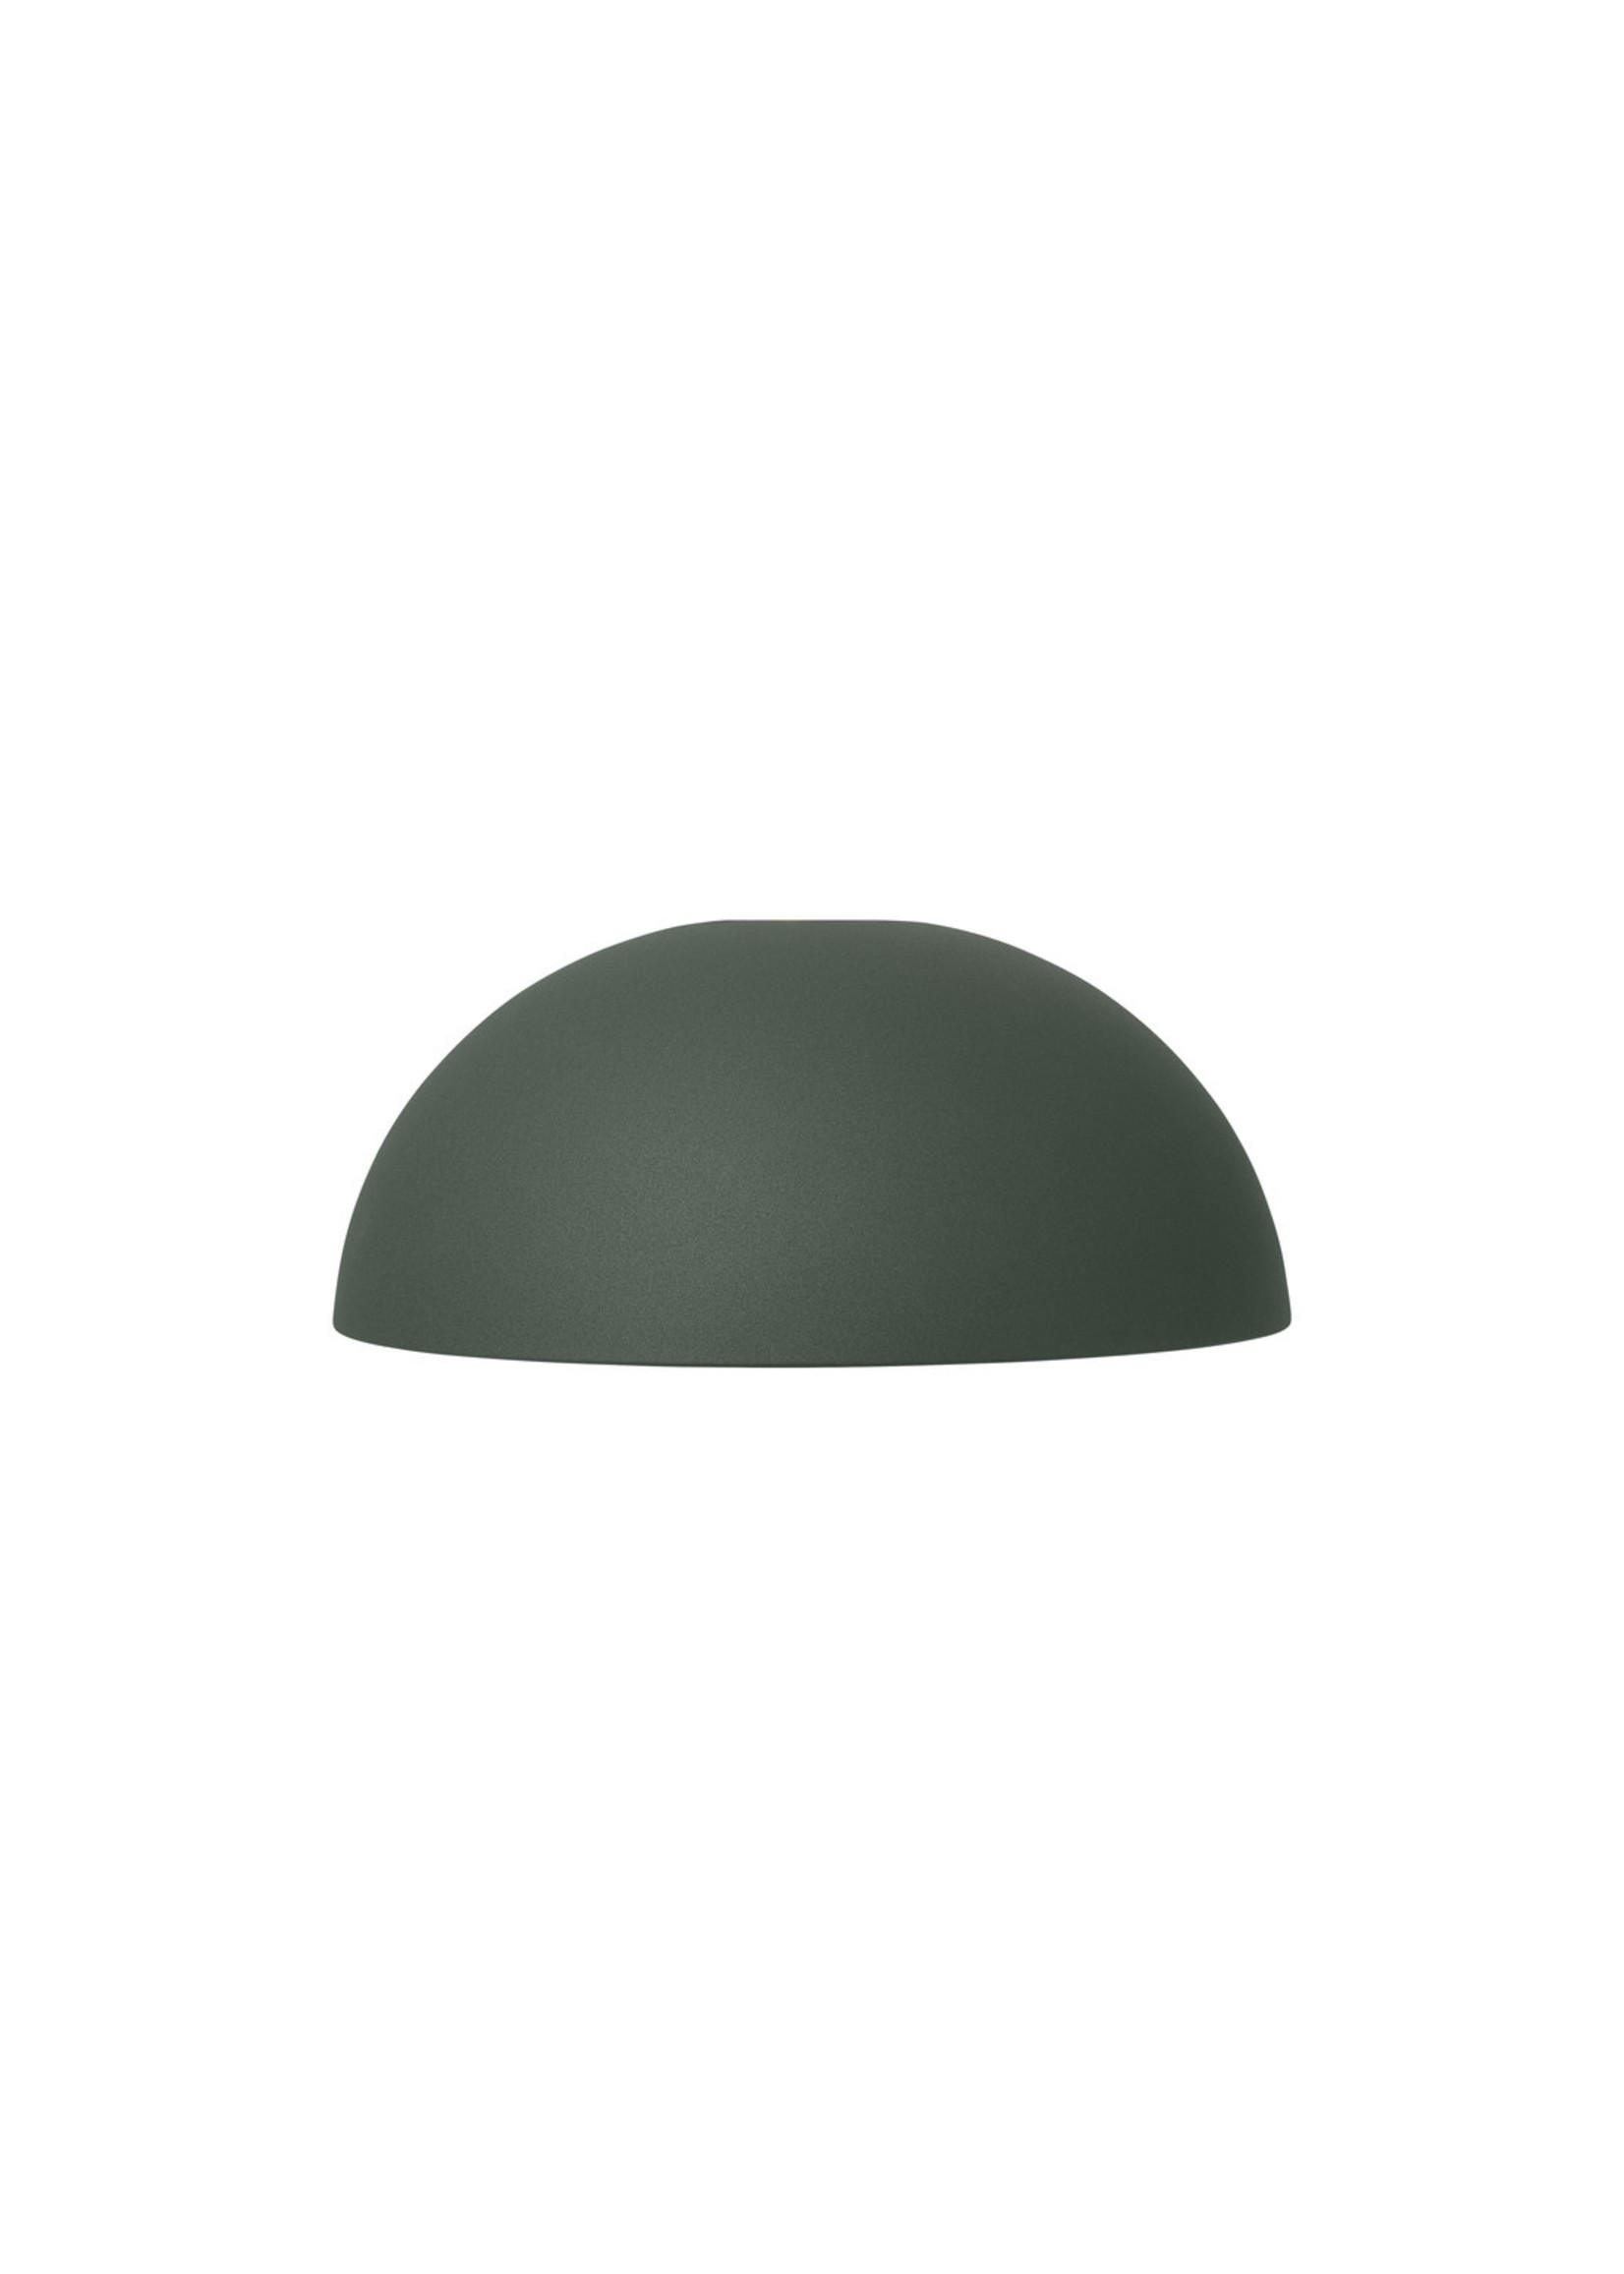 ferm LIVING ferm LIVING Lighting - Dome Shade - Dark Green